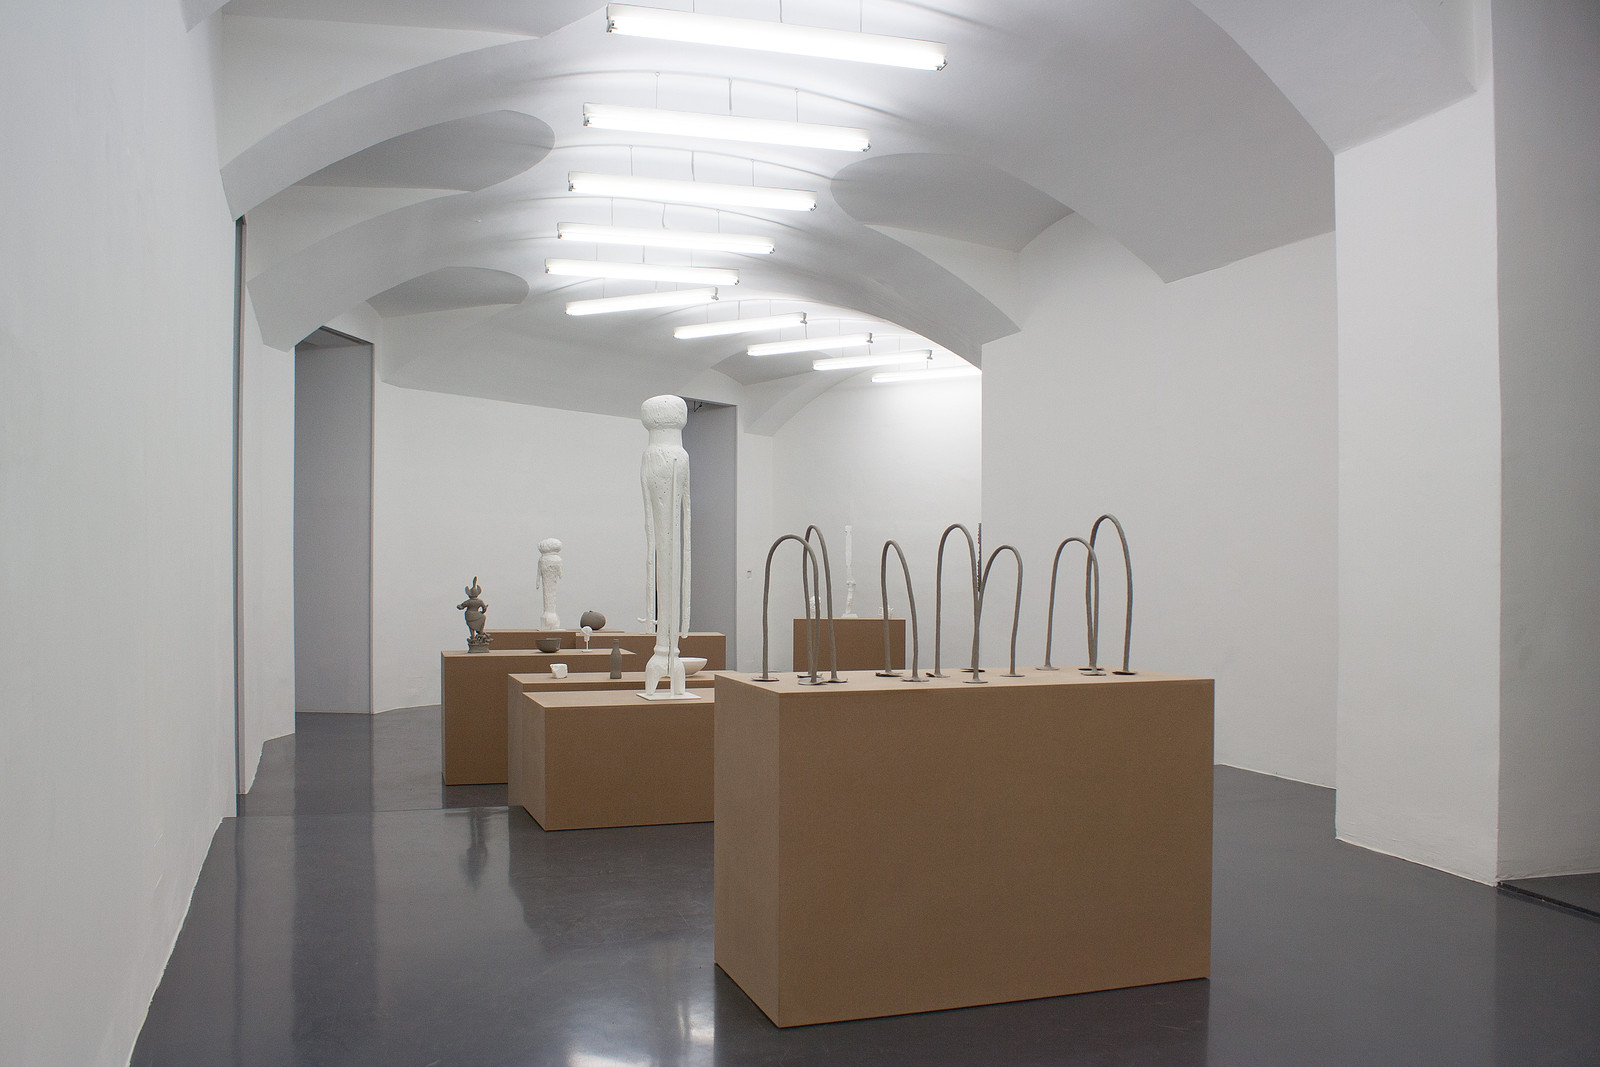 18 Gaylen Gerber exhibition Galerie Emanuel Layr Wien 2016 IMG_8375